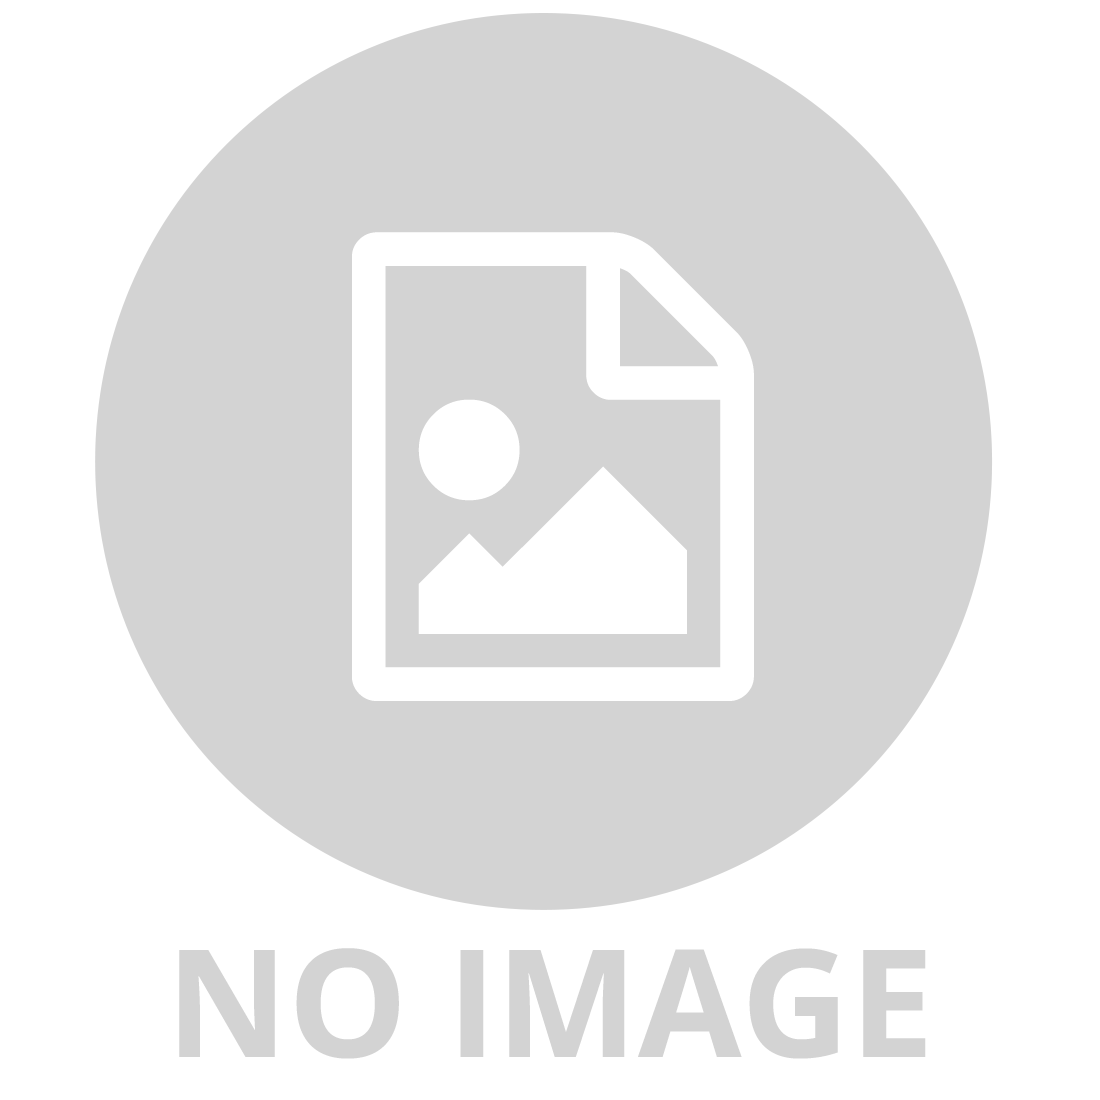 CRAYOLA 12 STICKS OF COLOURED CHALK